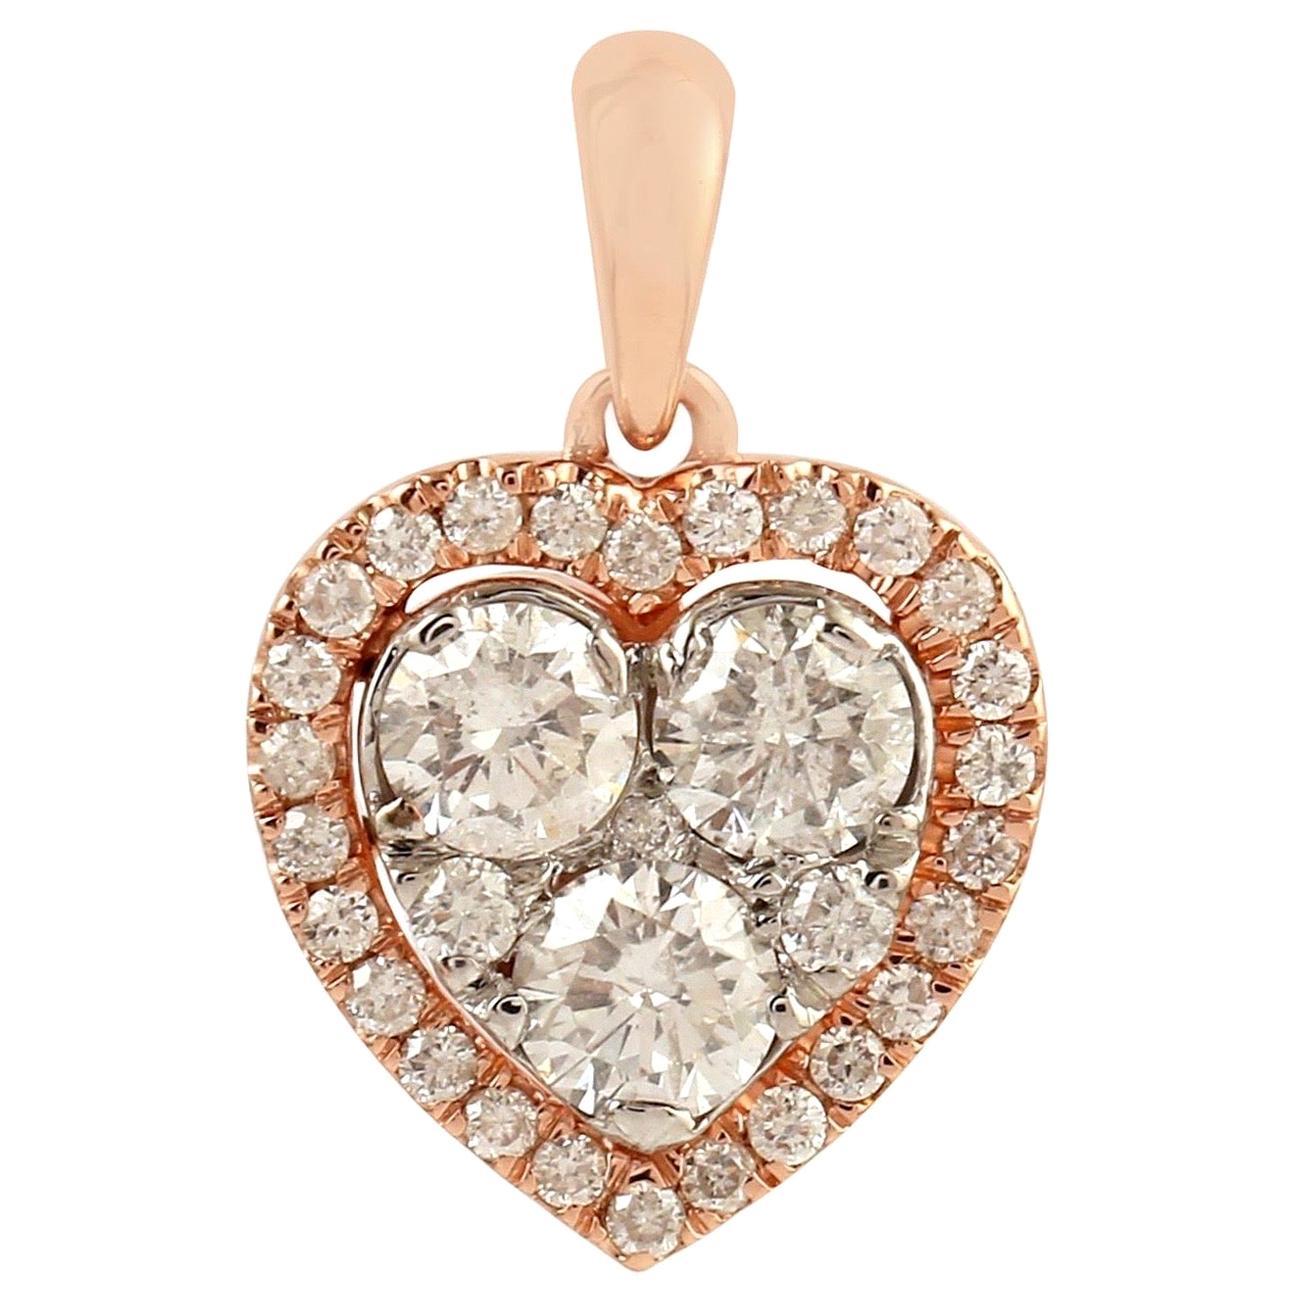 Heart 18 Karat Gold Diamond Pendant Necklace